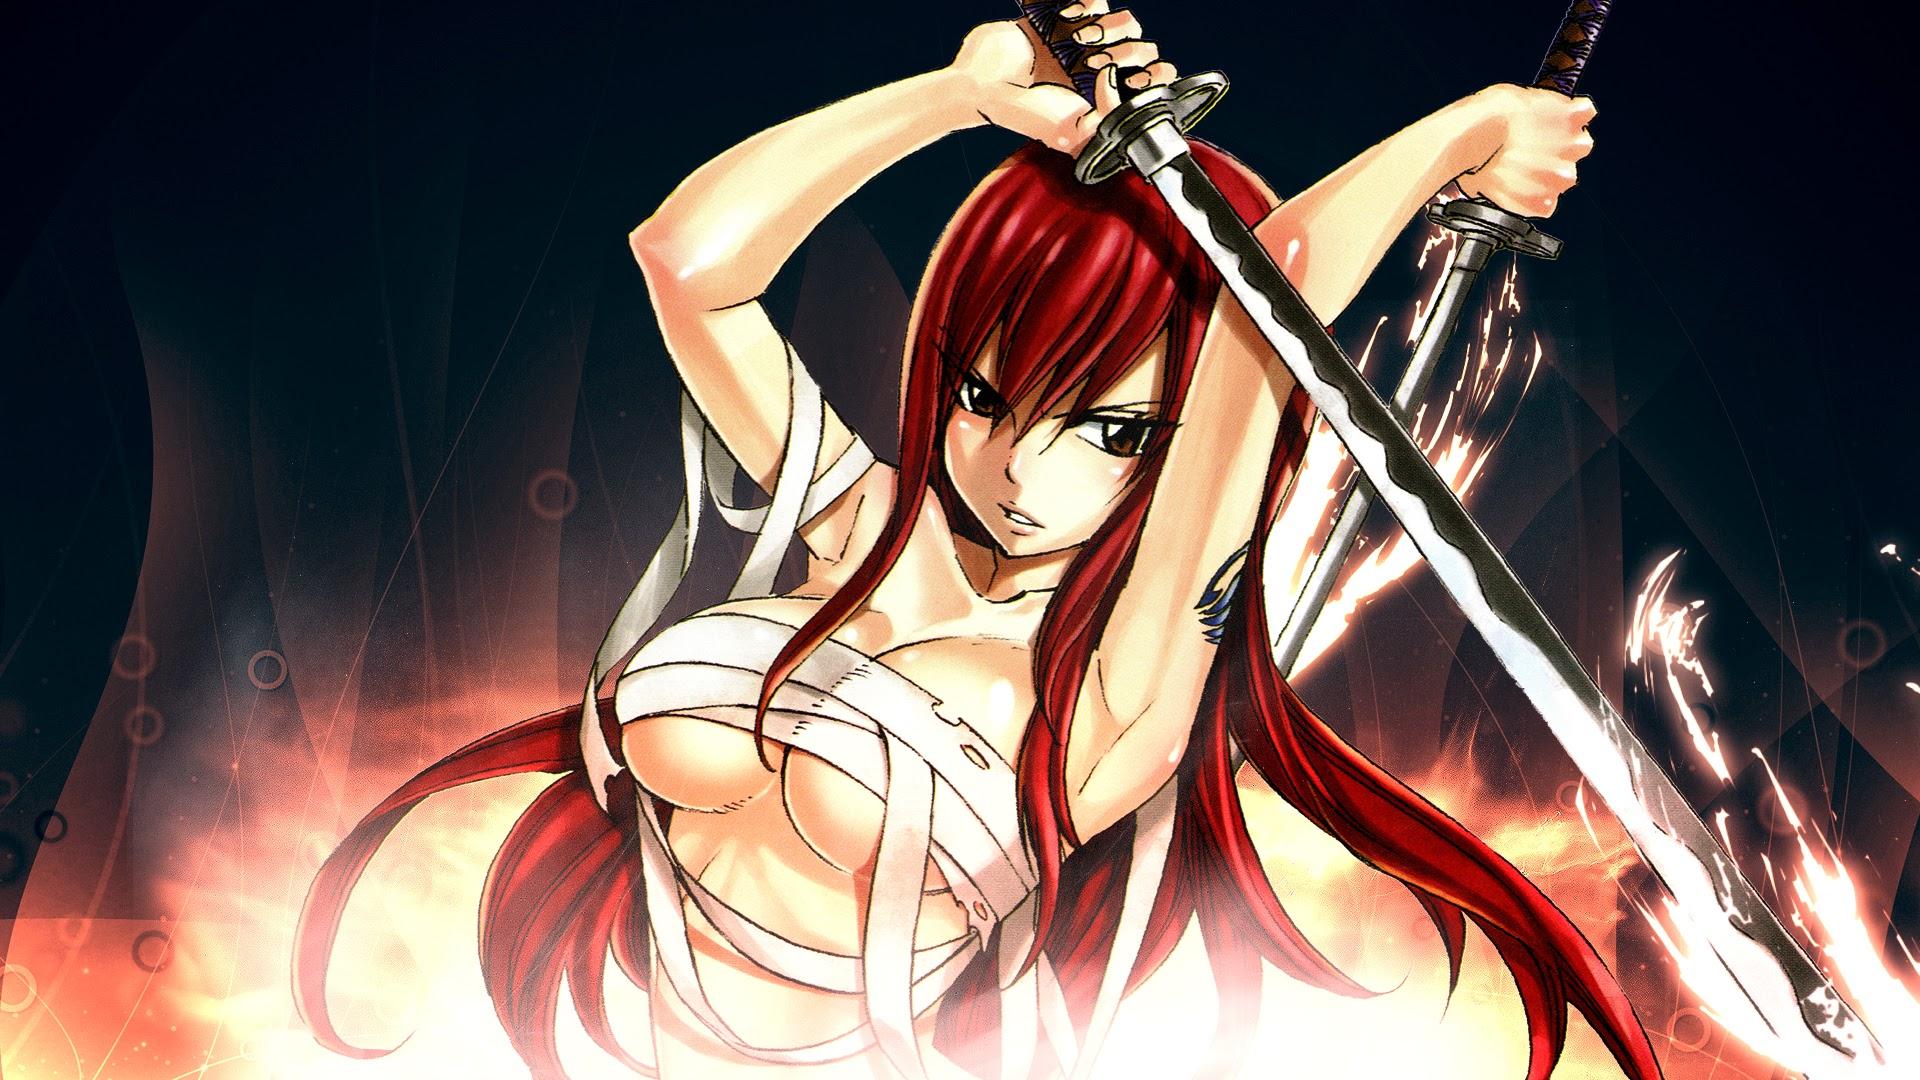 erza scarlet fairy tail anime girl hd wallpaper 1920x1080 7b 1920x1080